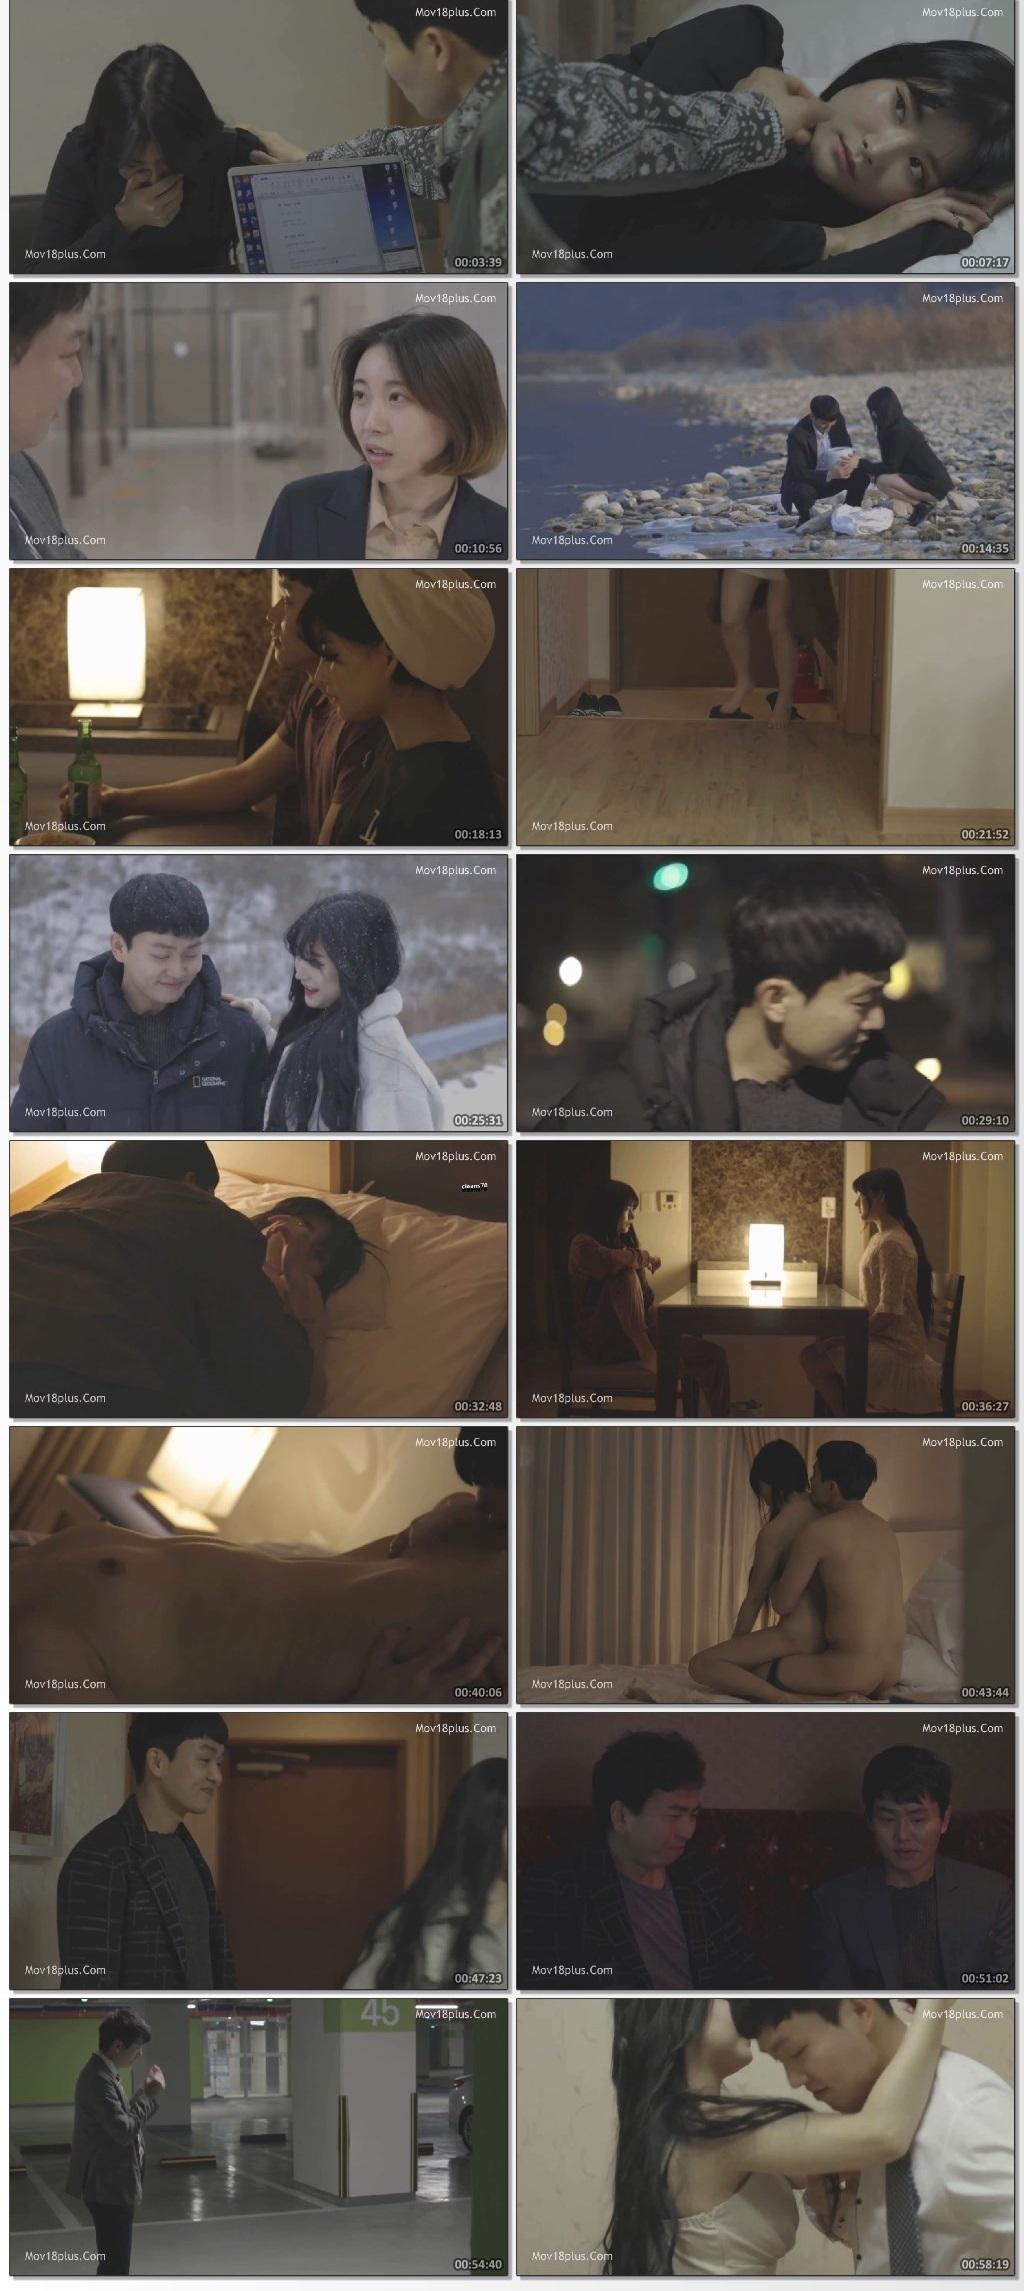 Scent-of-My-Sister-in-law-2021-www-filmguro-site-Korean-Movie-720p-HDRip-600-MB-mkv-thumbs